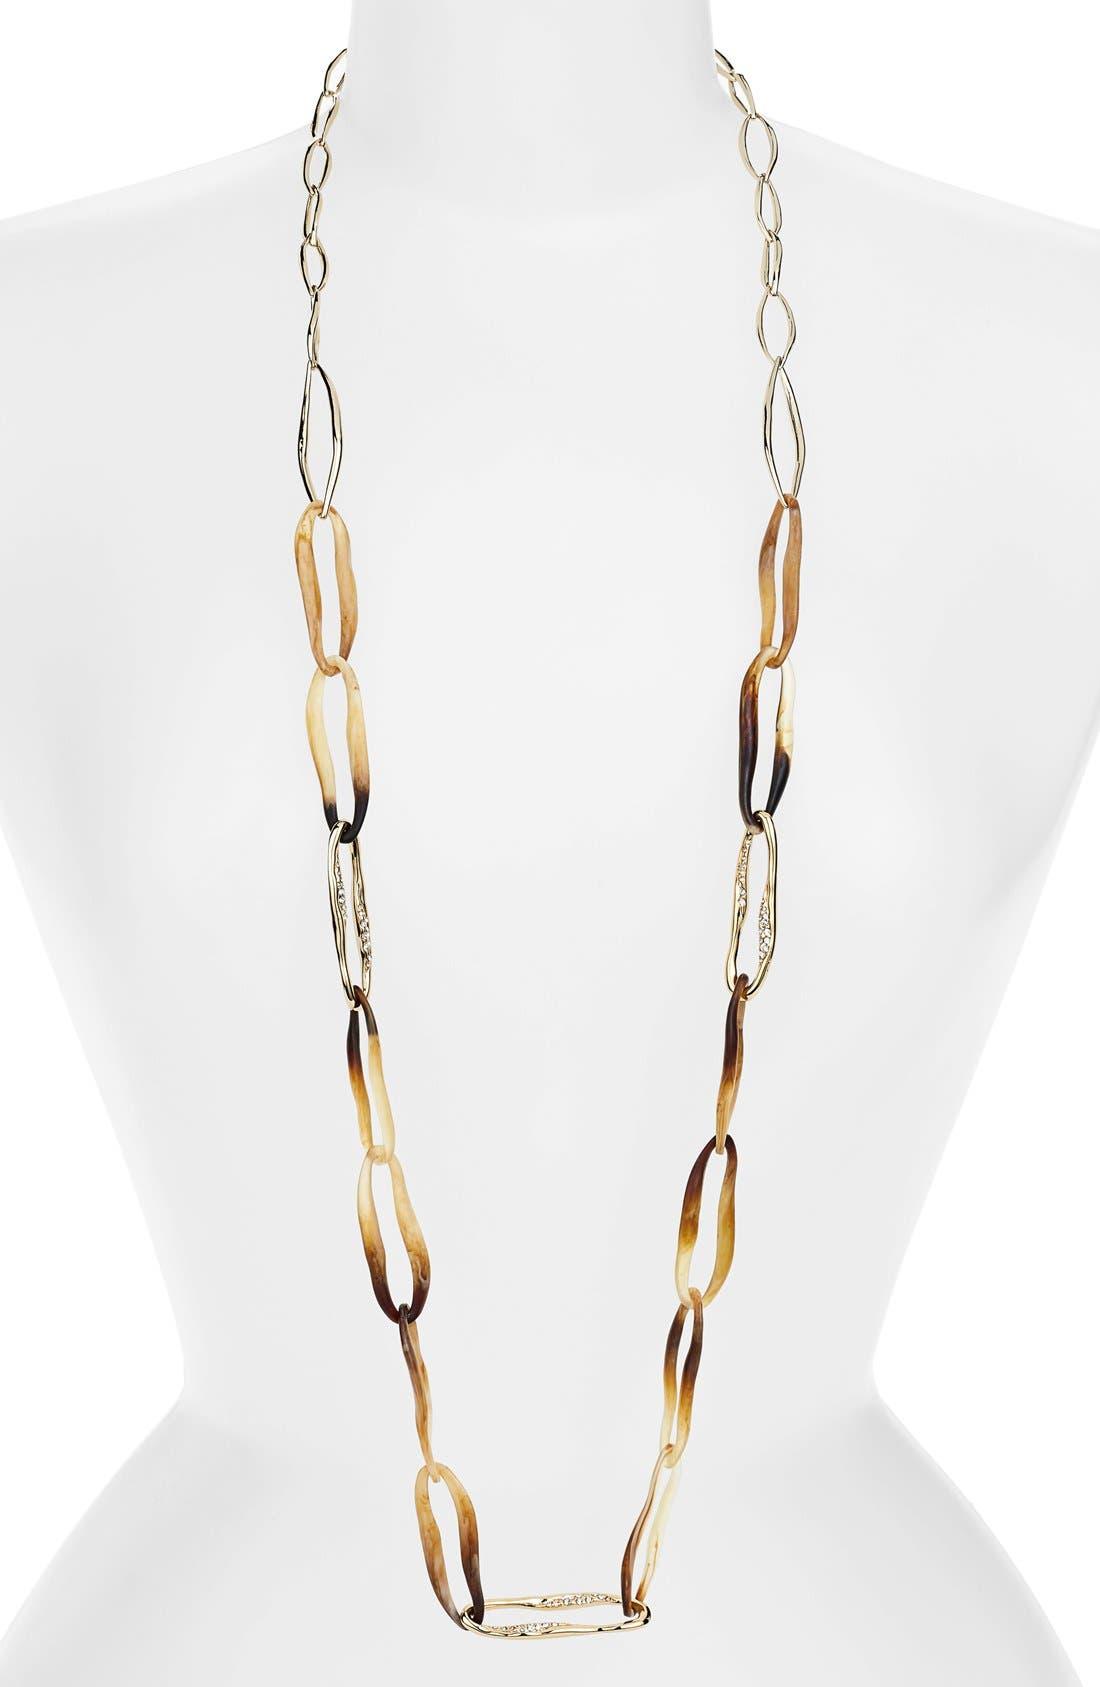 Main Image - Alexis Bittar 'Miss Havisham - Liquid' Extra Long Link Necklace